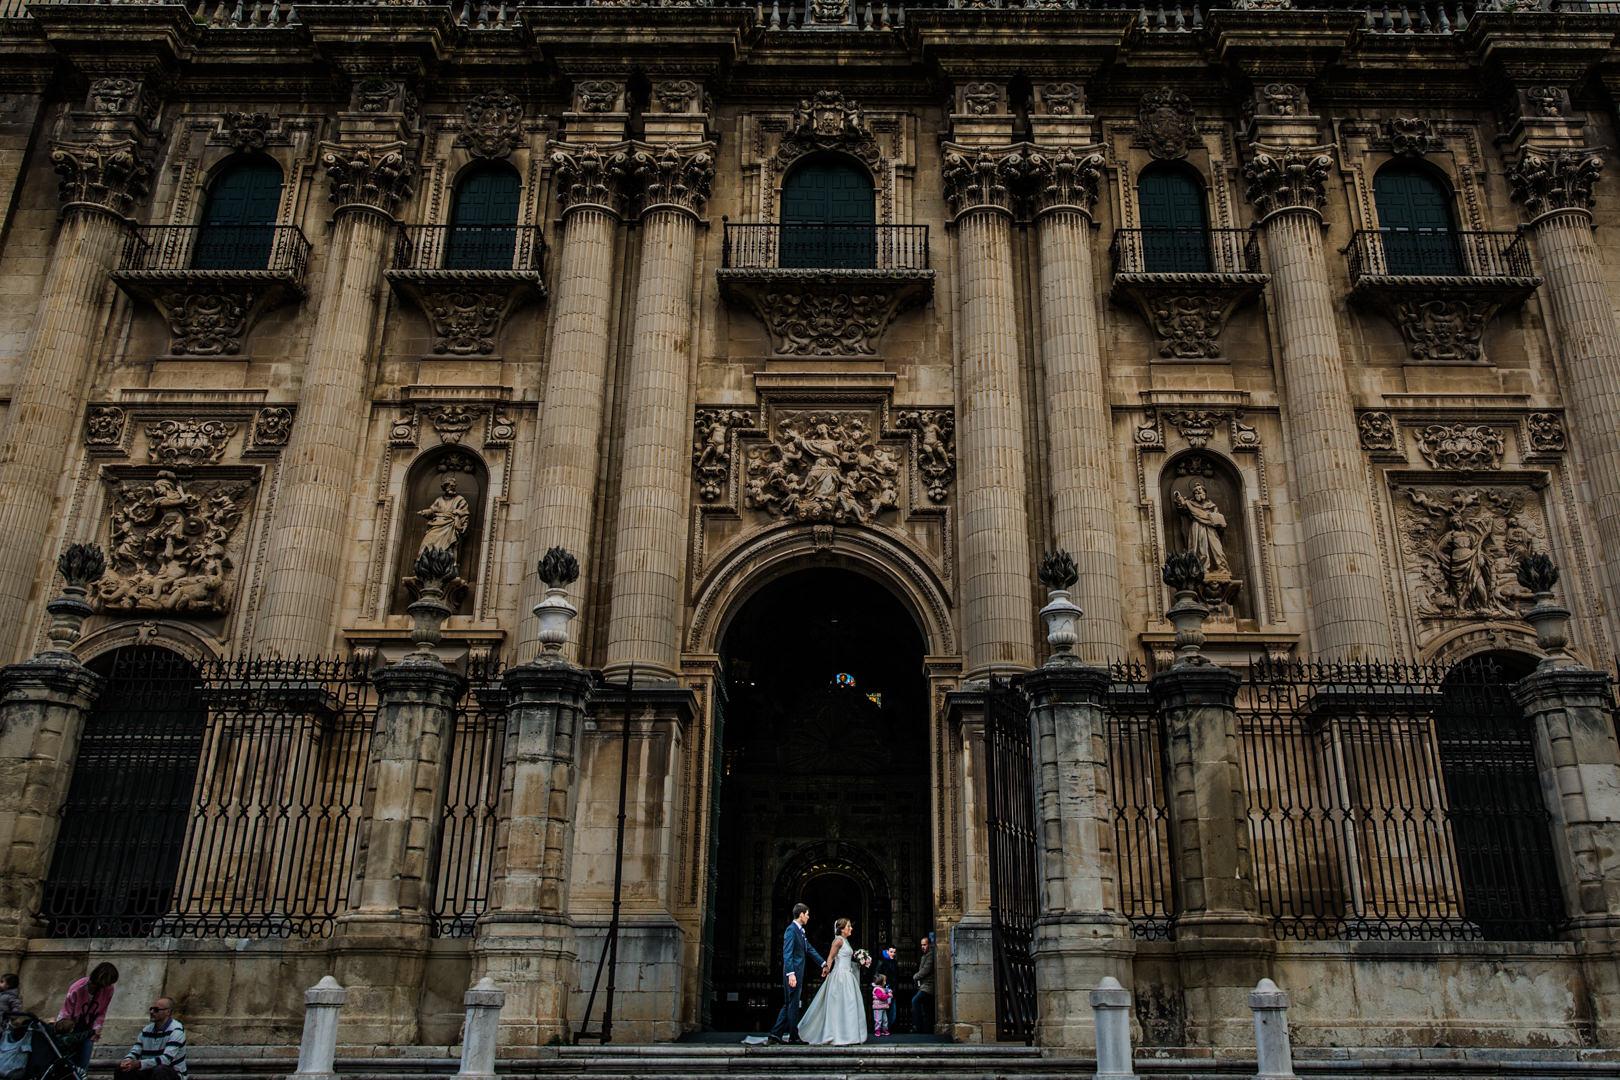 Boda-Catedral-Jaen-Hamburgo-Maria-David-engagement-Rafael-Torres-fotografo-bodas-sevilla-madrid-barcelona-wedding-photographer--29.jpg